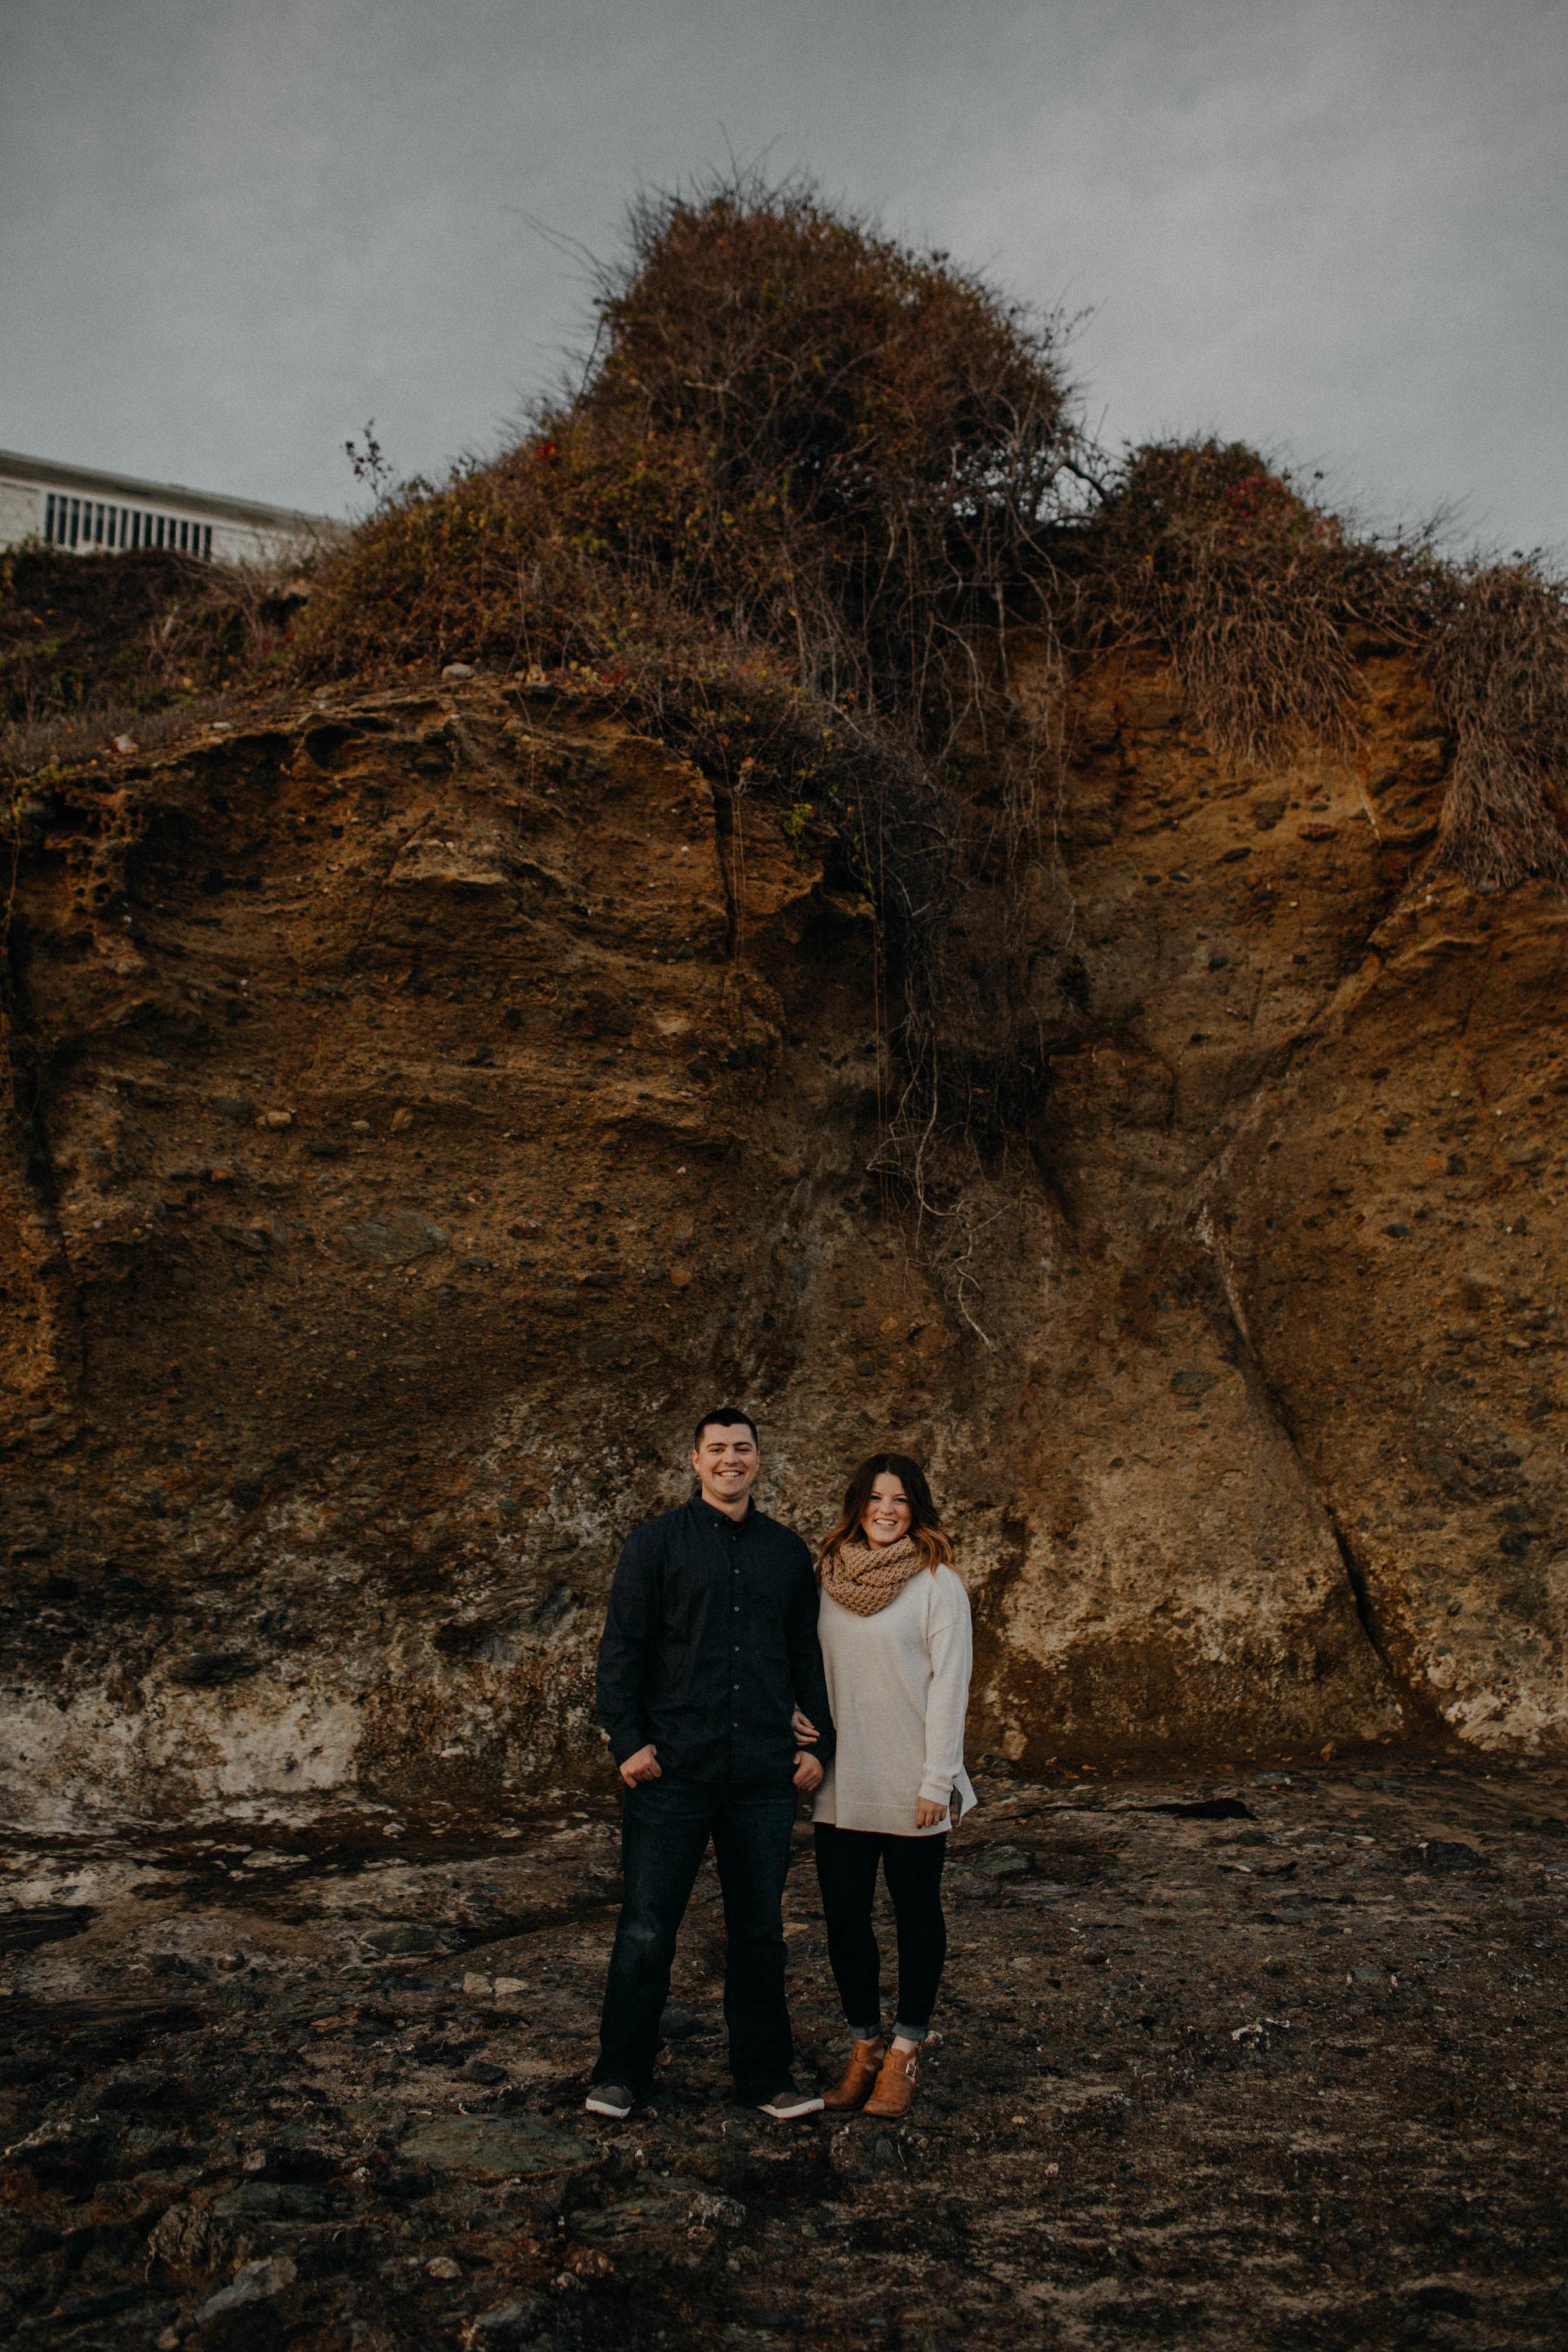 Laguna Beach Engagement Photos Kate and Curtis Grace E. Jones Photography92.jpg